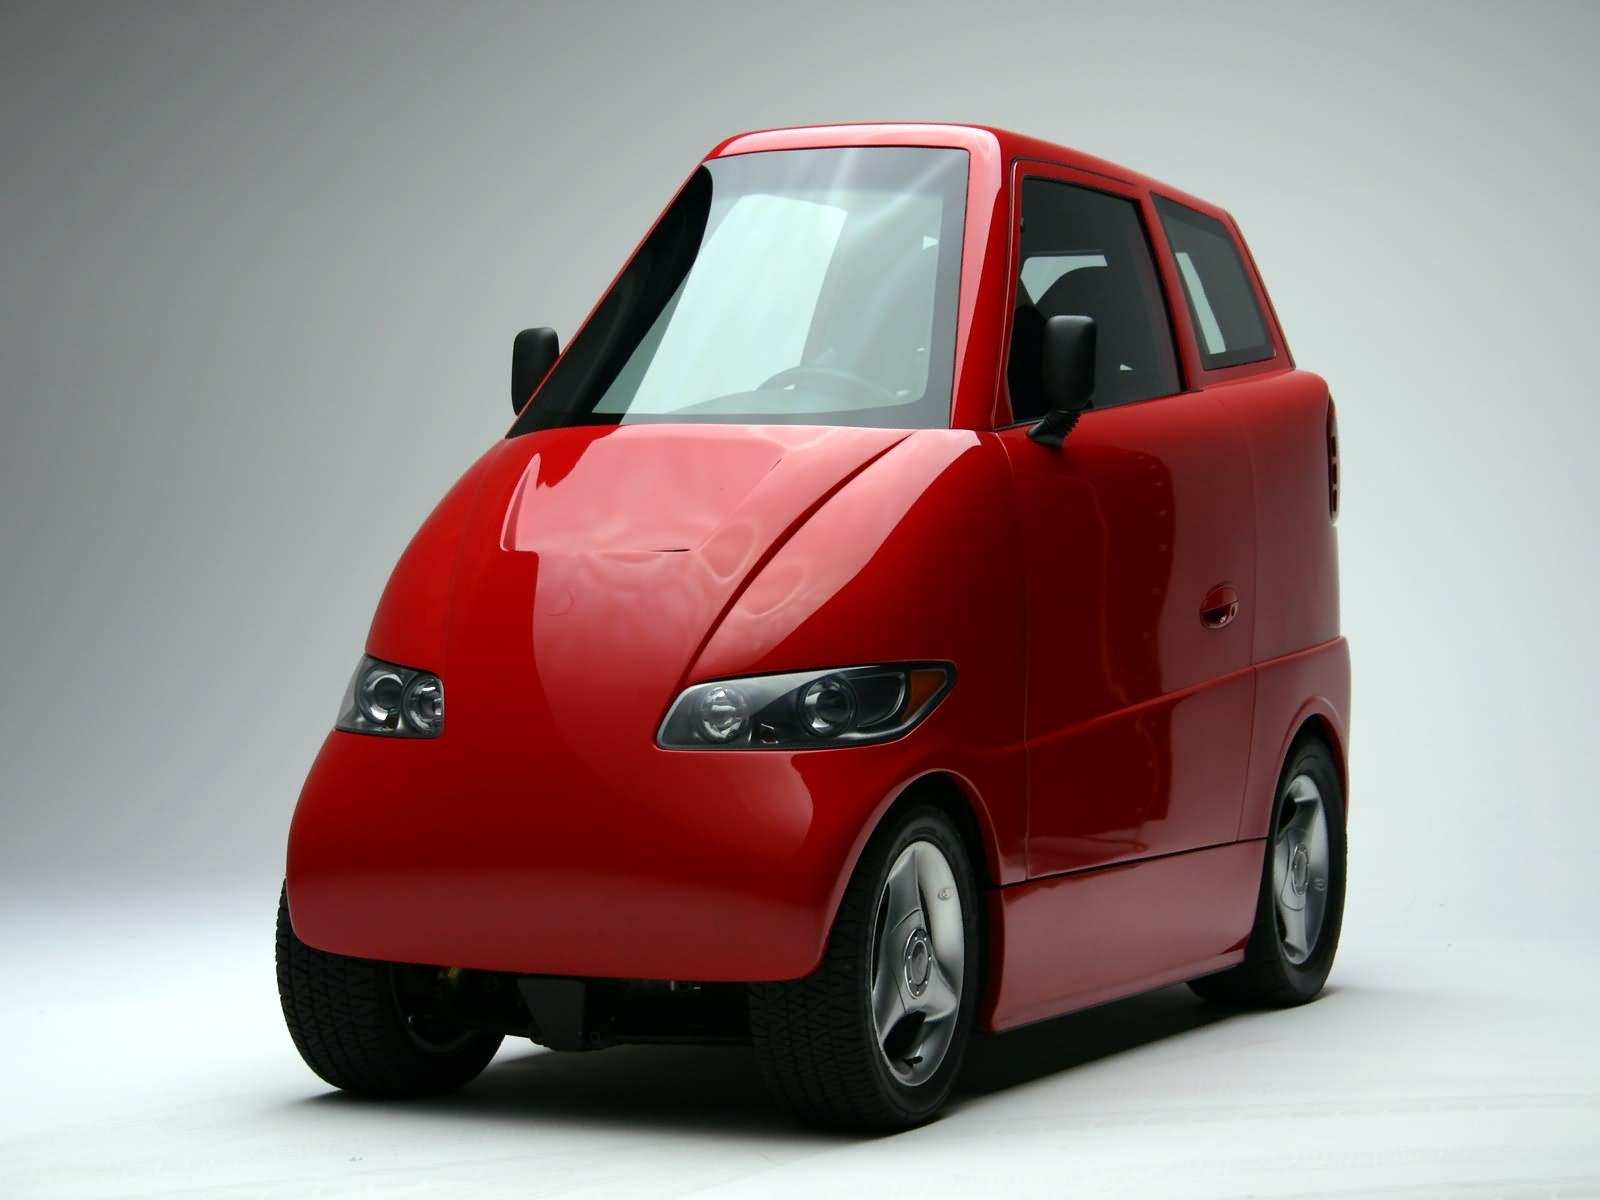 Wallpaper Electric Car Netcarshow Netcar Car Images Car